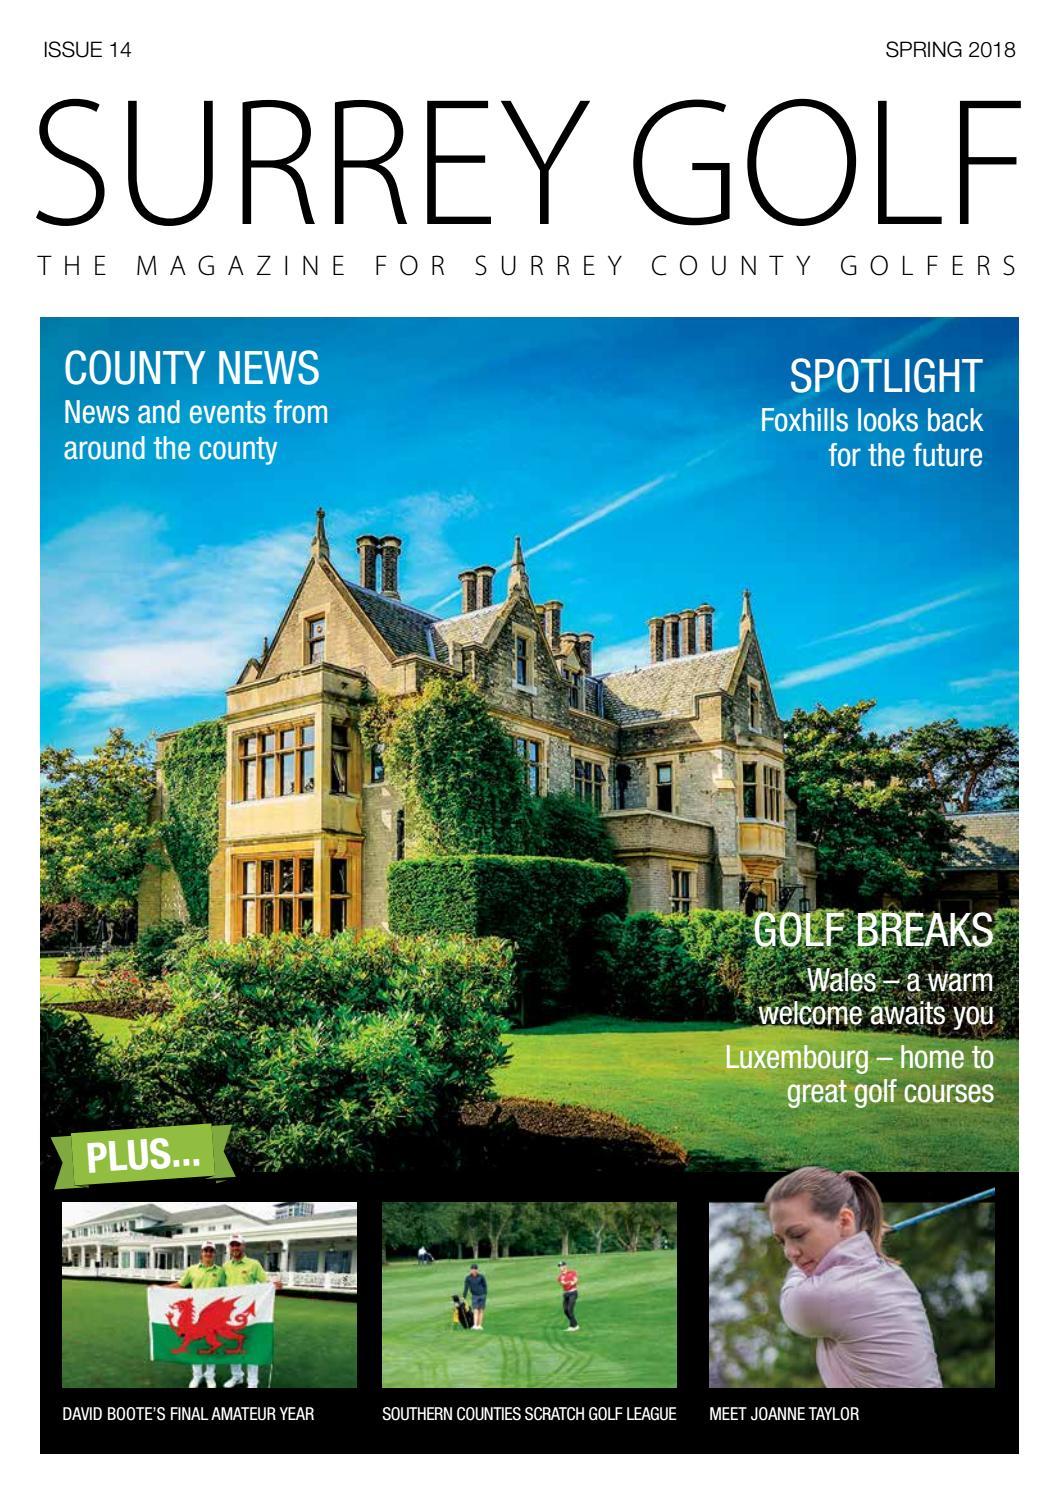 Surrey golf spring 2018 by Surrey Golf Magazine - issuu